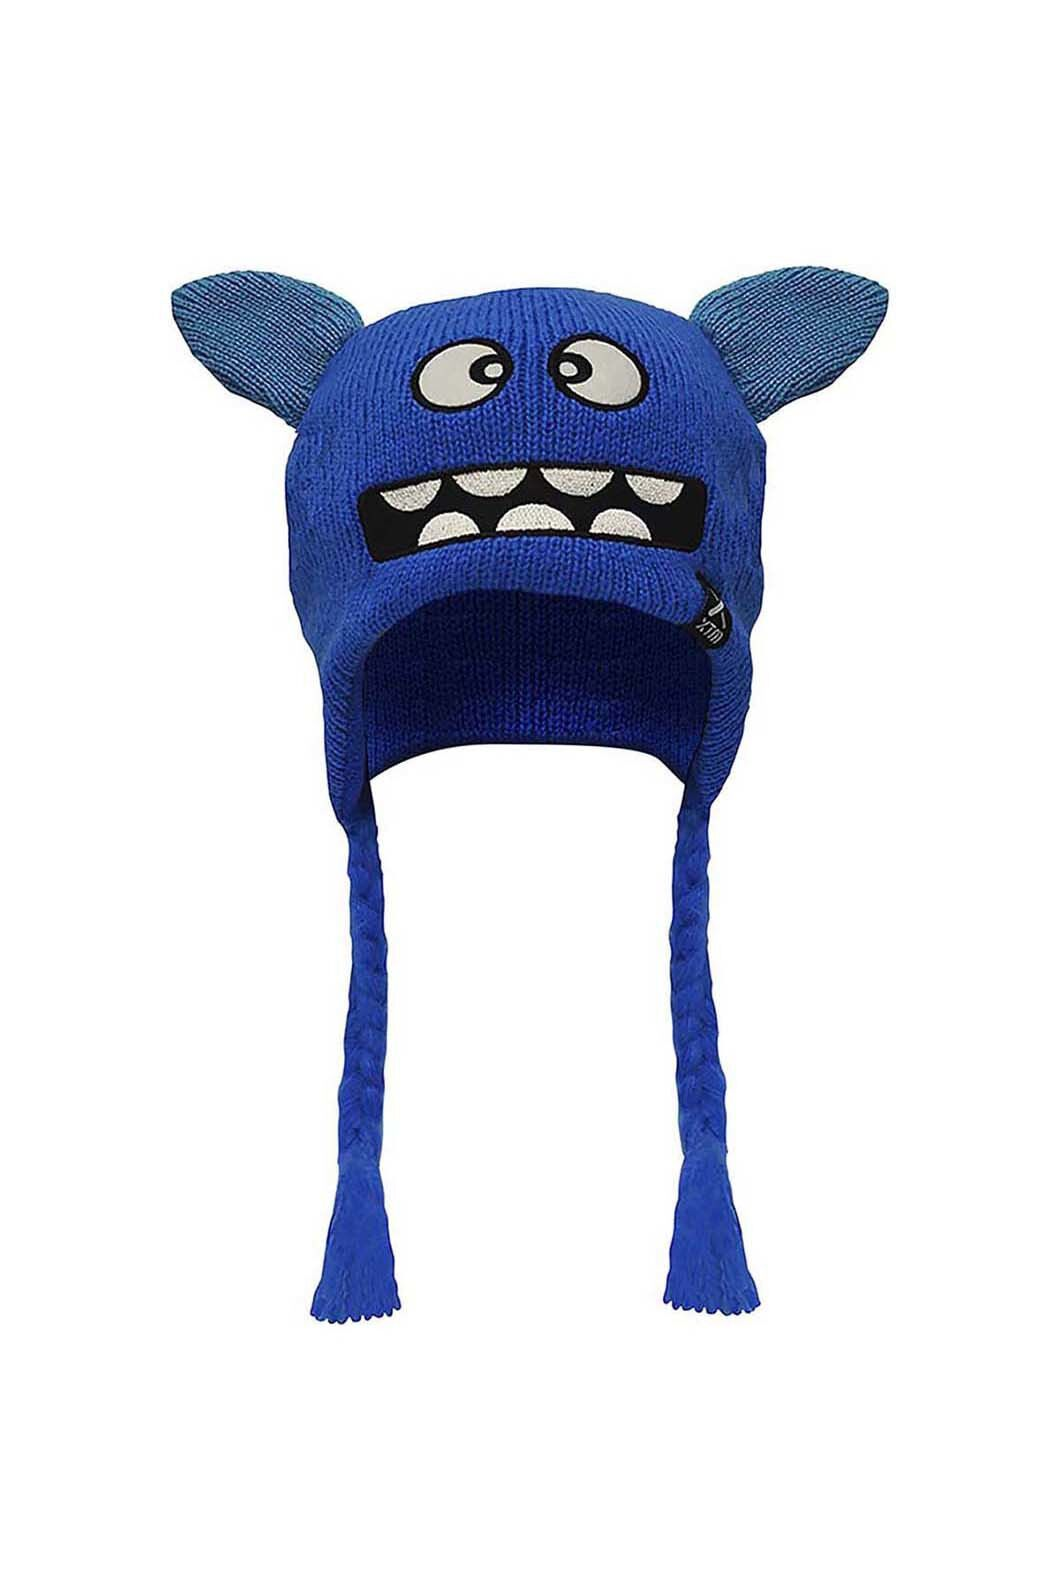 XTM Zoolander Beanie - Kids', Blue, hi-res